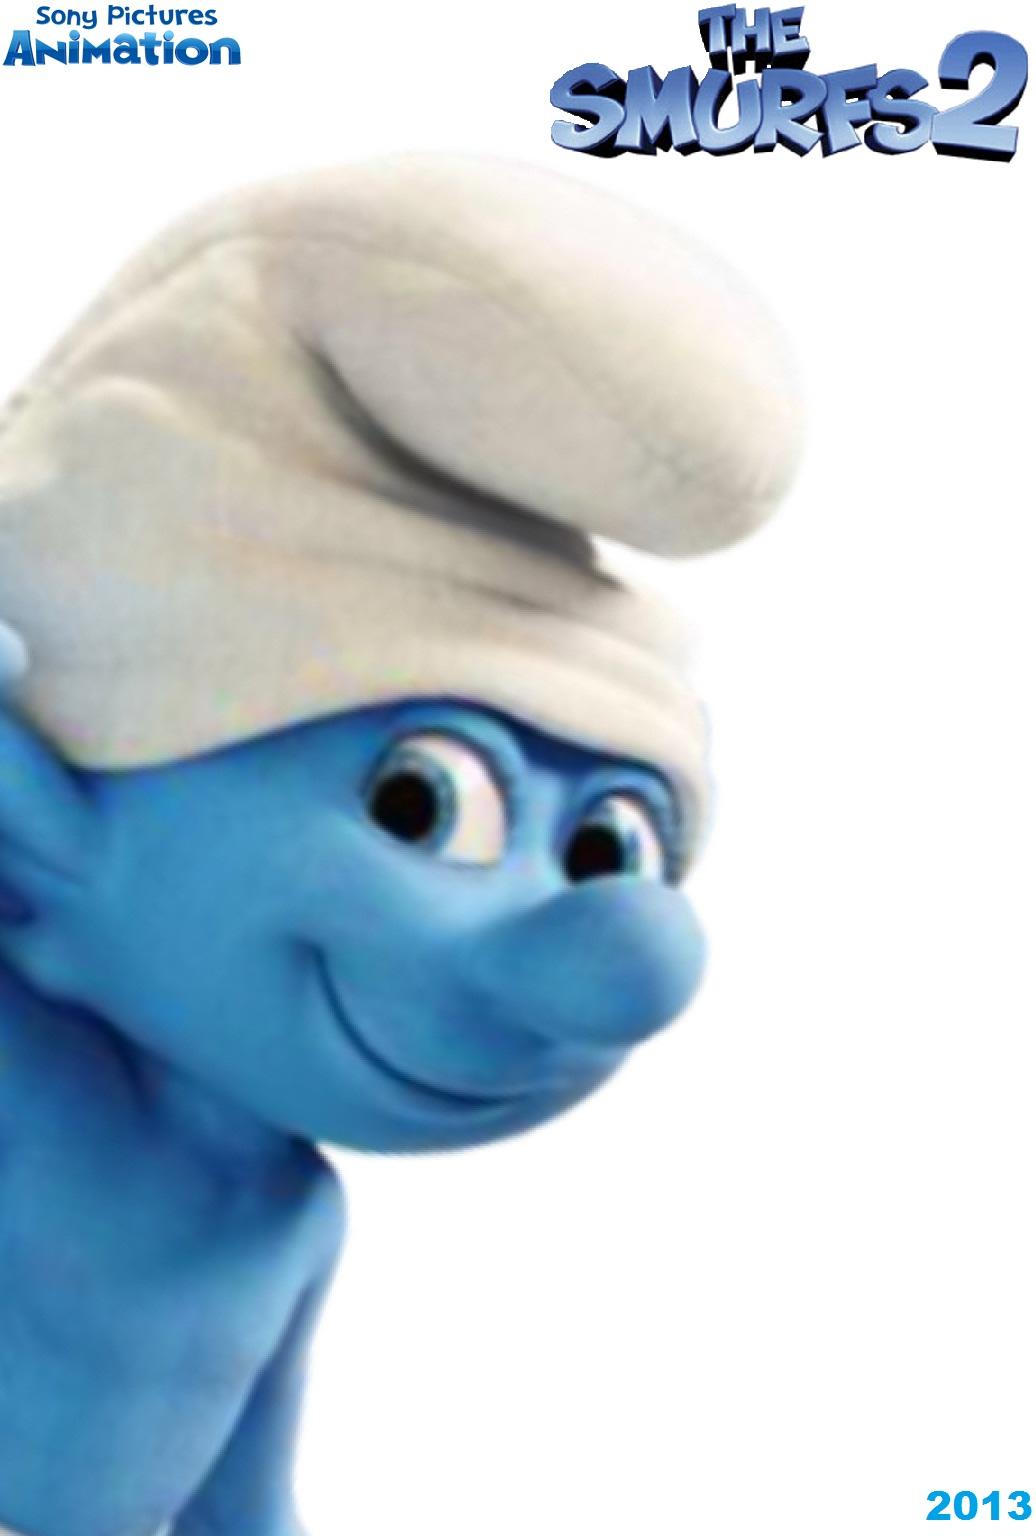 image - the smurfs 2 2013 (clumsy) | moviepedia | fandom powered